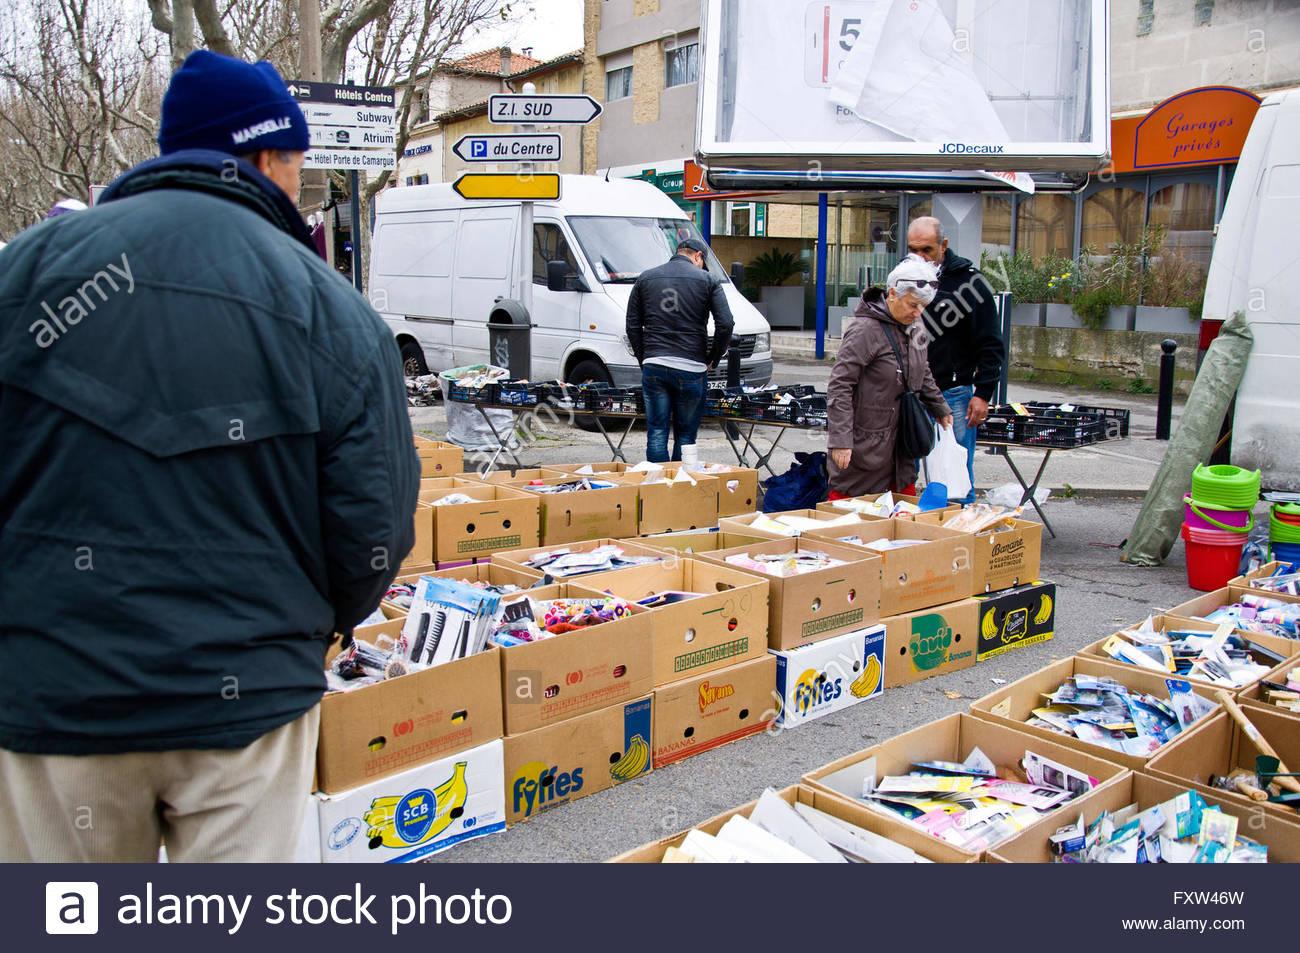 Traditional Market, Arles, Bouches du Rhône, Provence, France - Stock Image